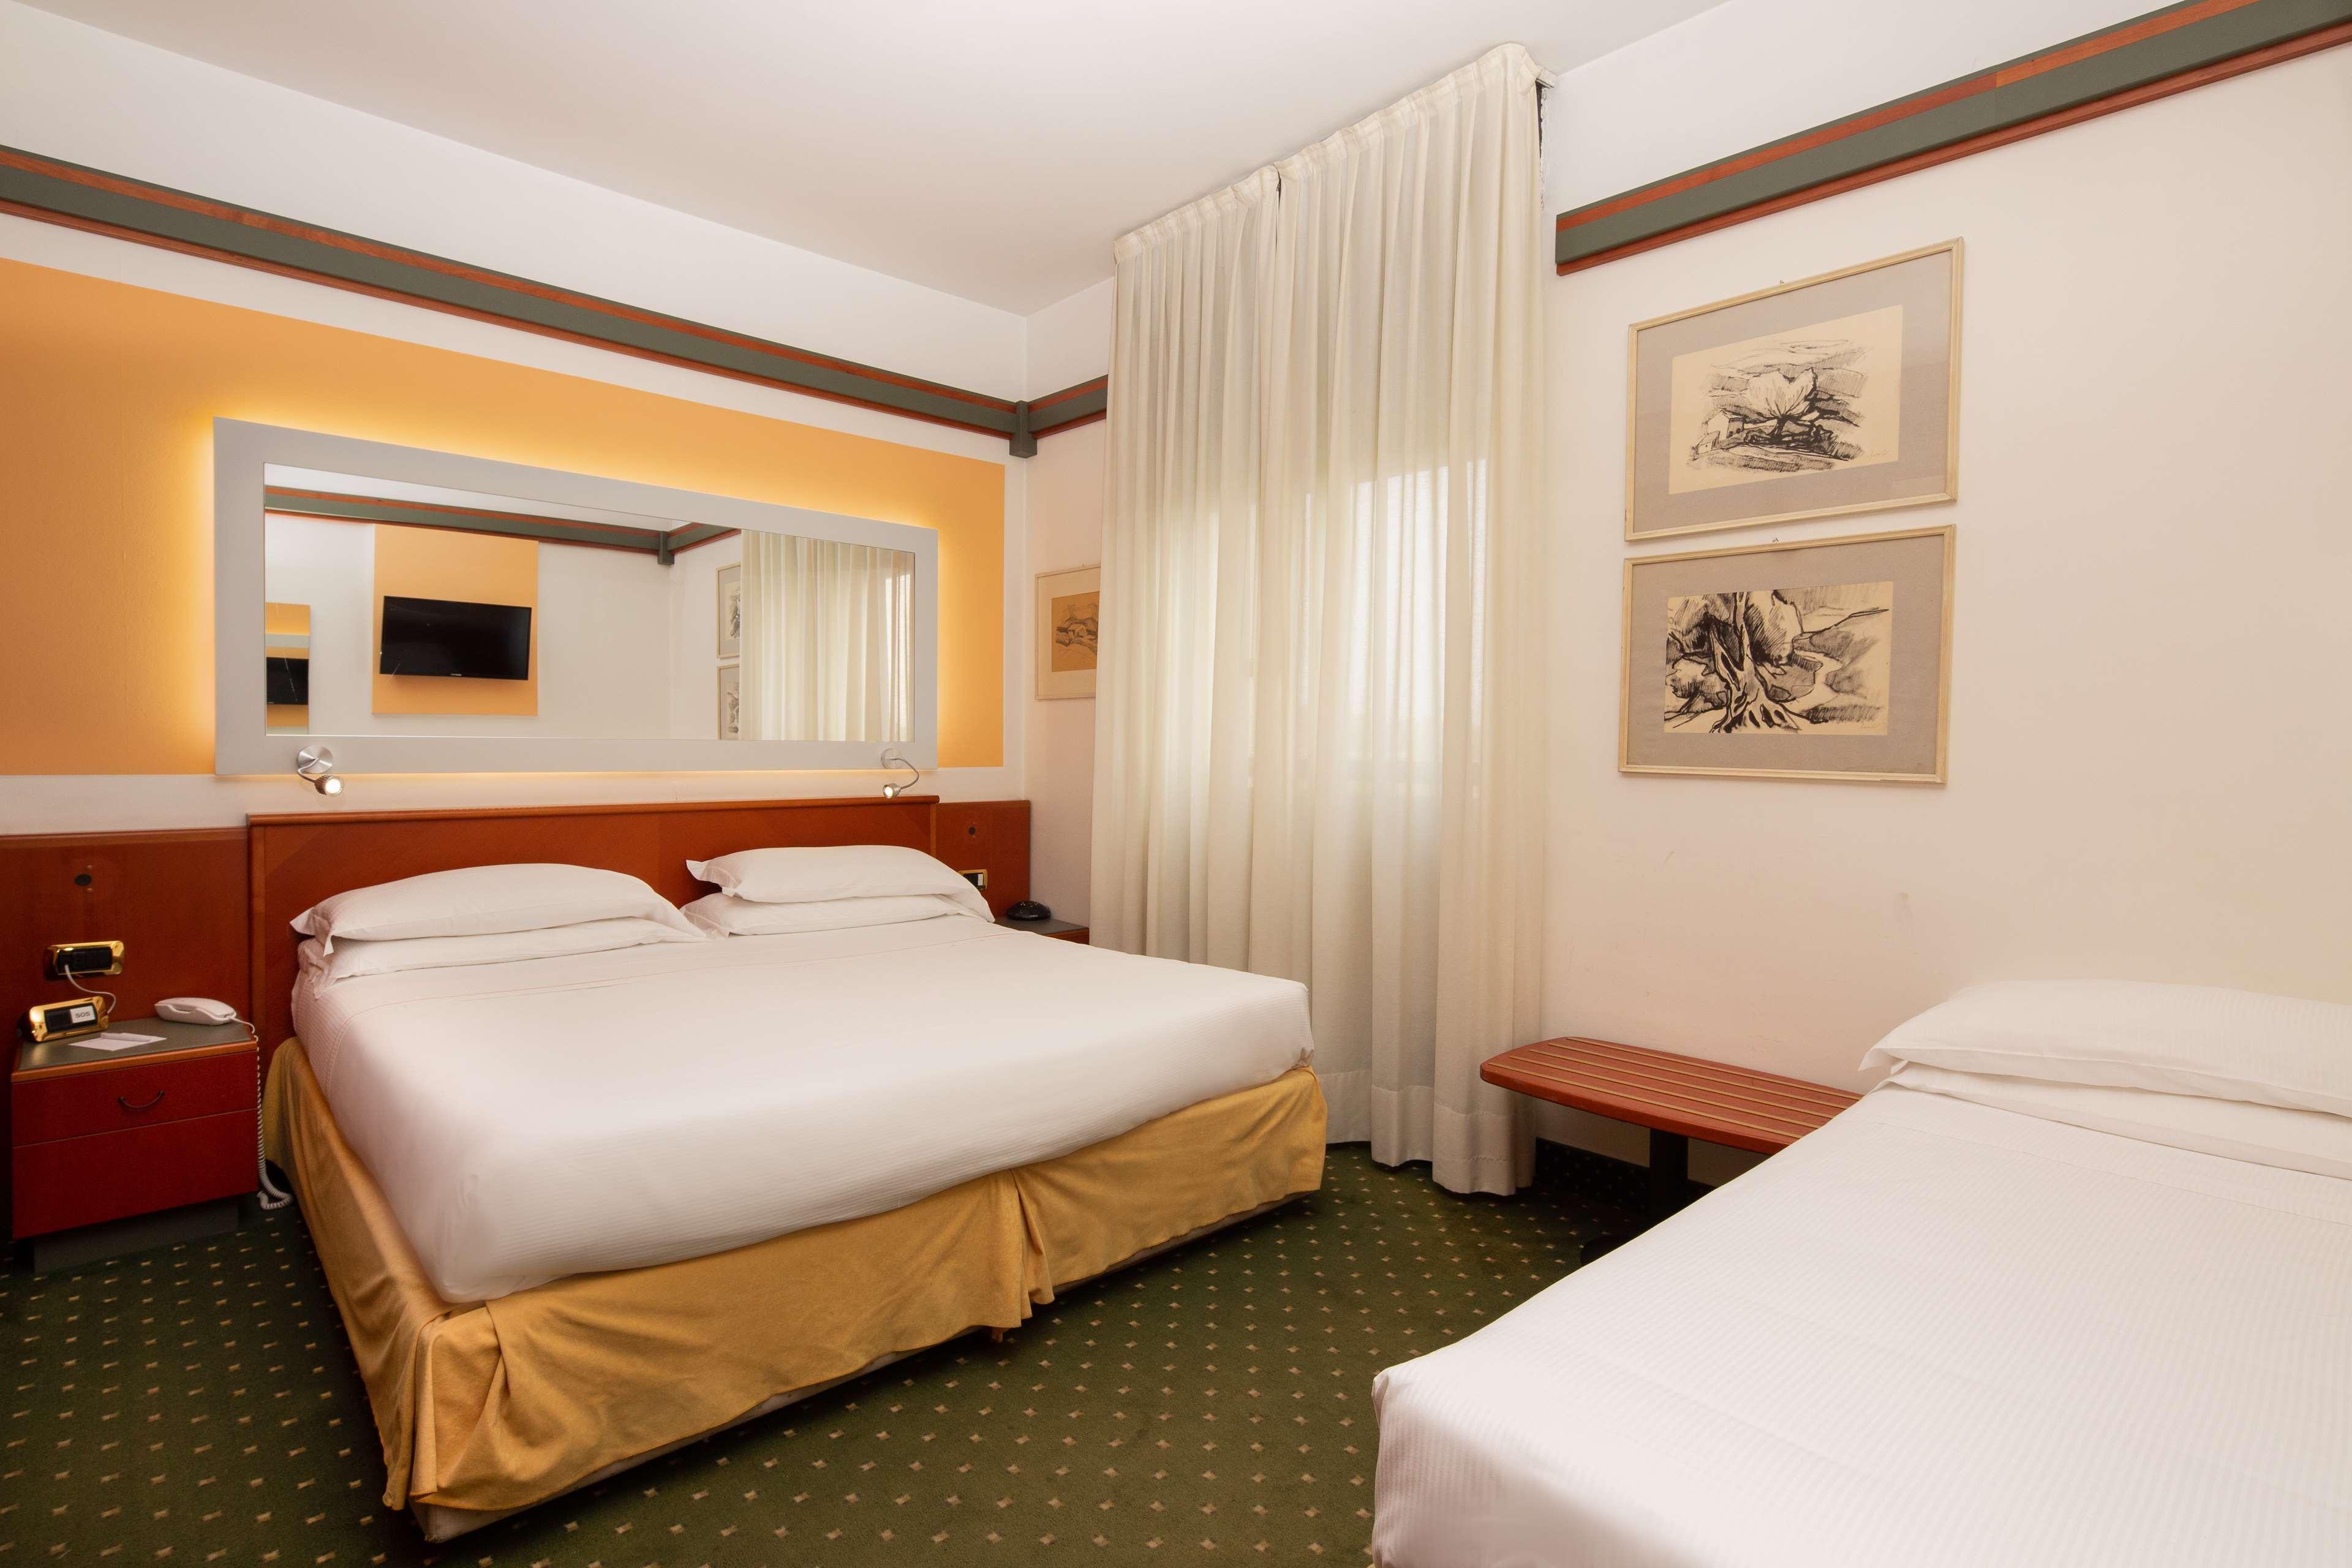 Best Western Jet Hotel